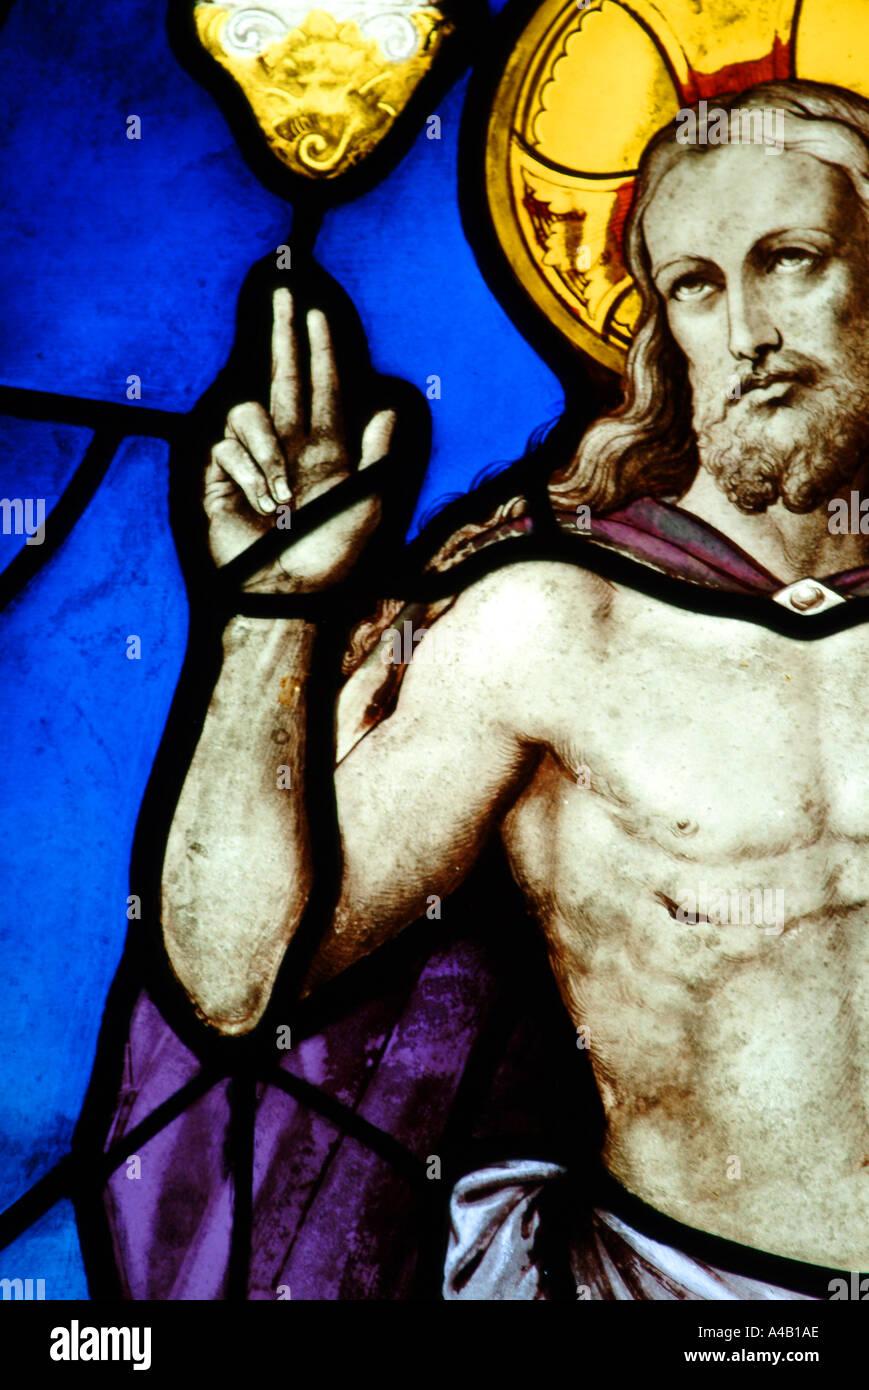 jesus christ god jesus christ god peace stained glass window